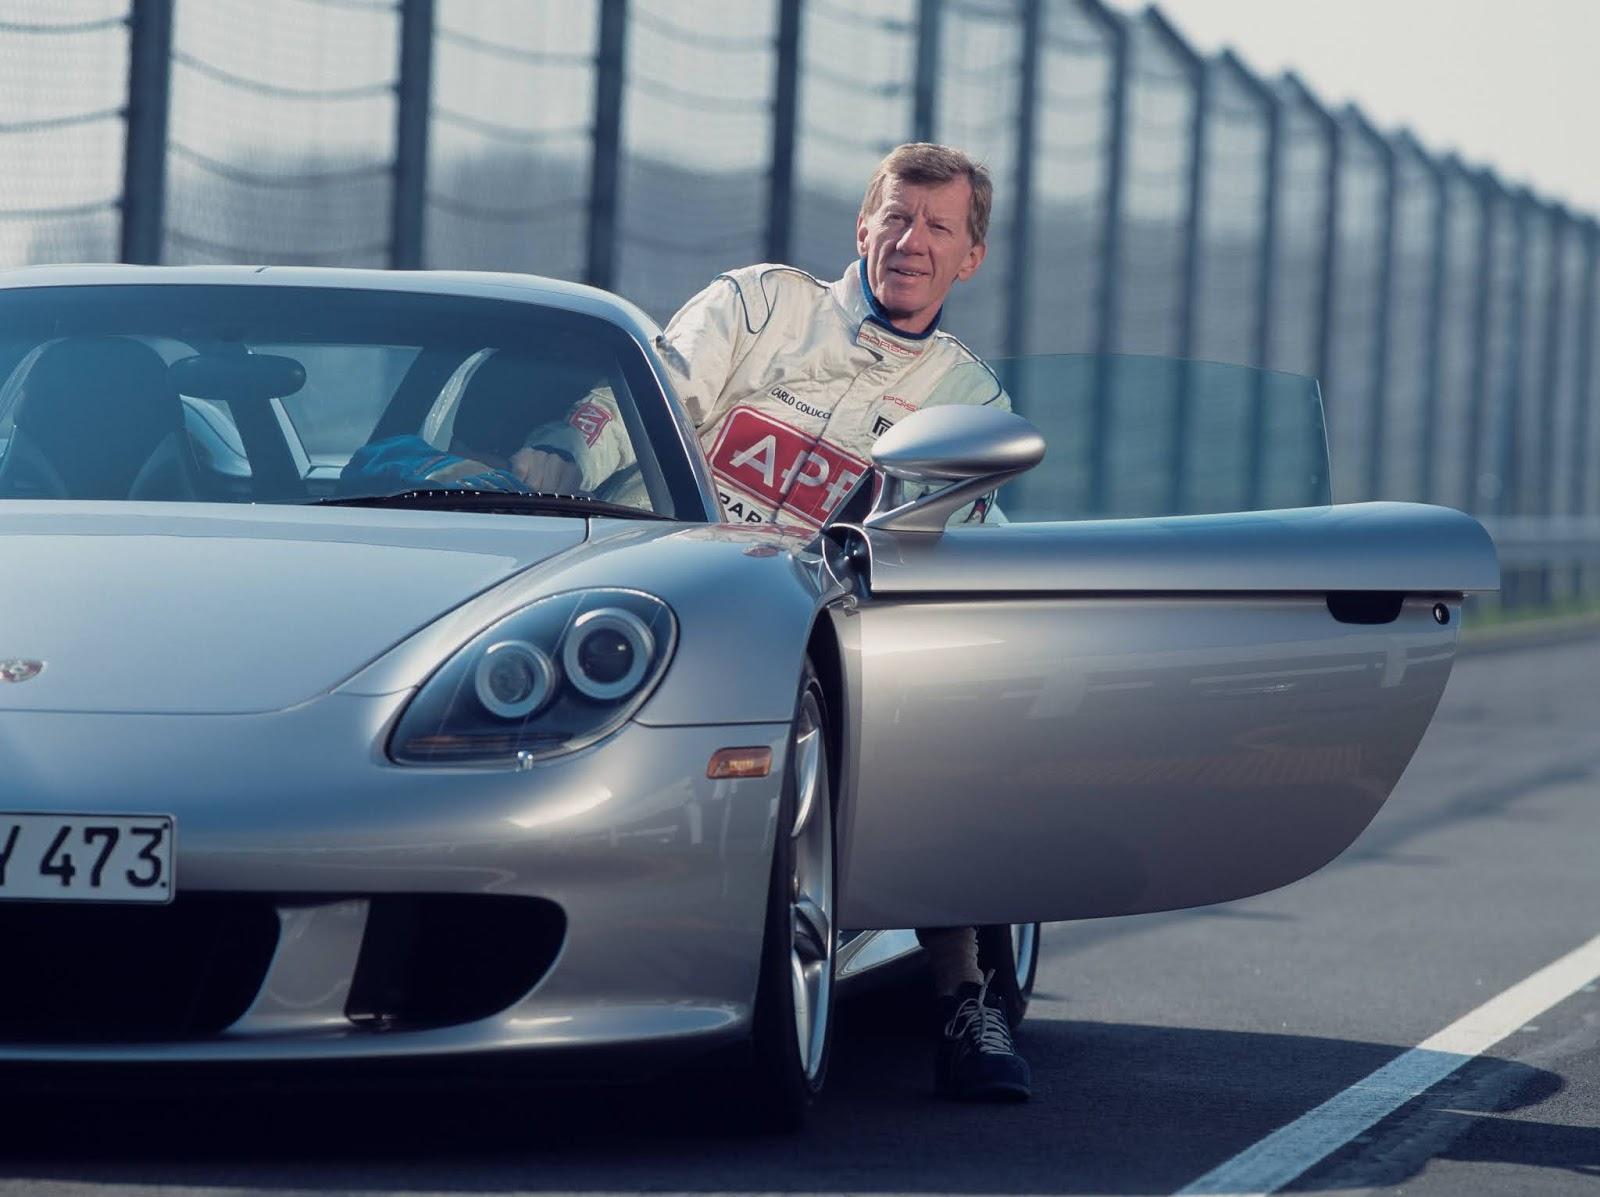 P04 0149 a4 Porsche Carrera GT : Ένα αγωνιστικό LeMans, για το δρόμο Carrera GT, Porsche, Porsche Carrera GT, retrocar, retrocar sunday, supercar, zblog